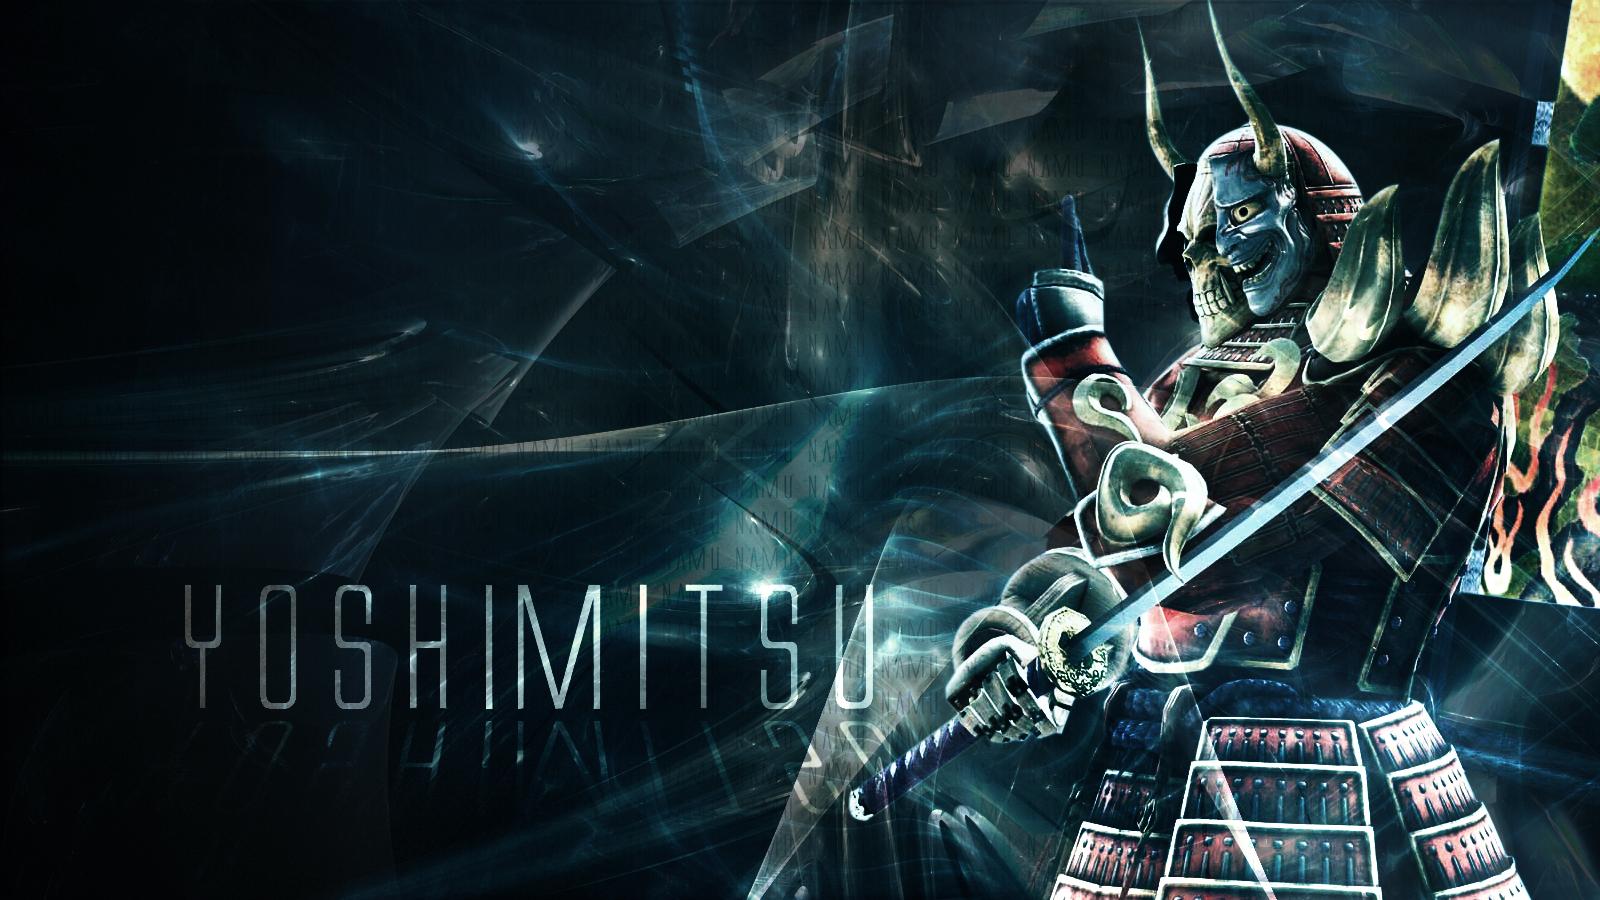 Yoshimitsu by CrazyTaco93